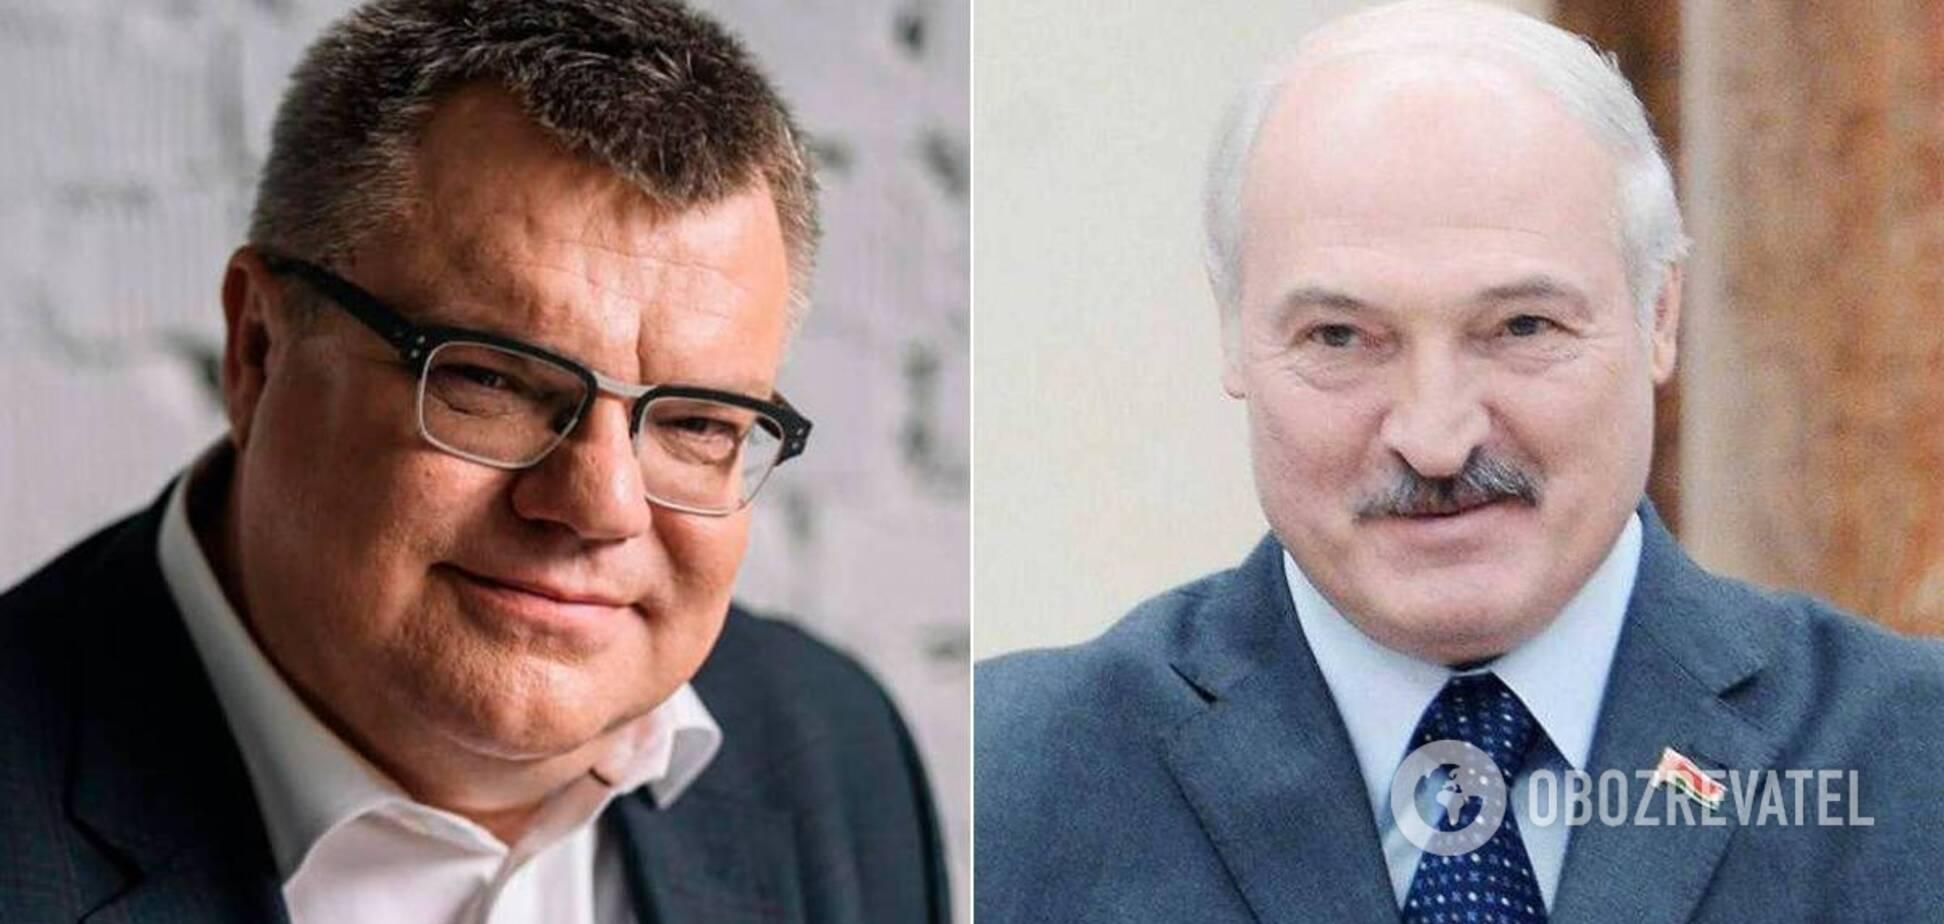 Головного конкурента Лукашенка не пустили на вибори президента